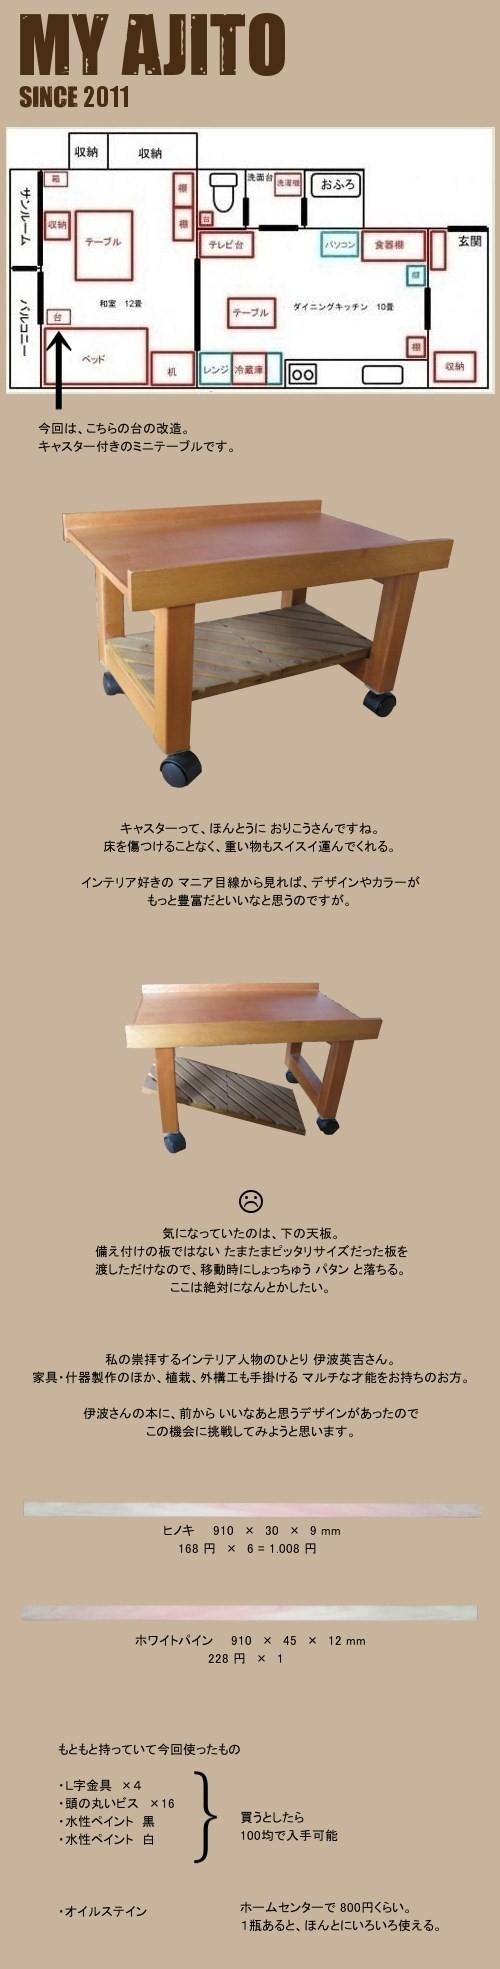 DIY3_1.jpg